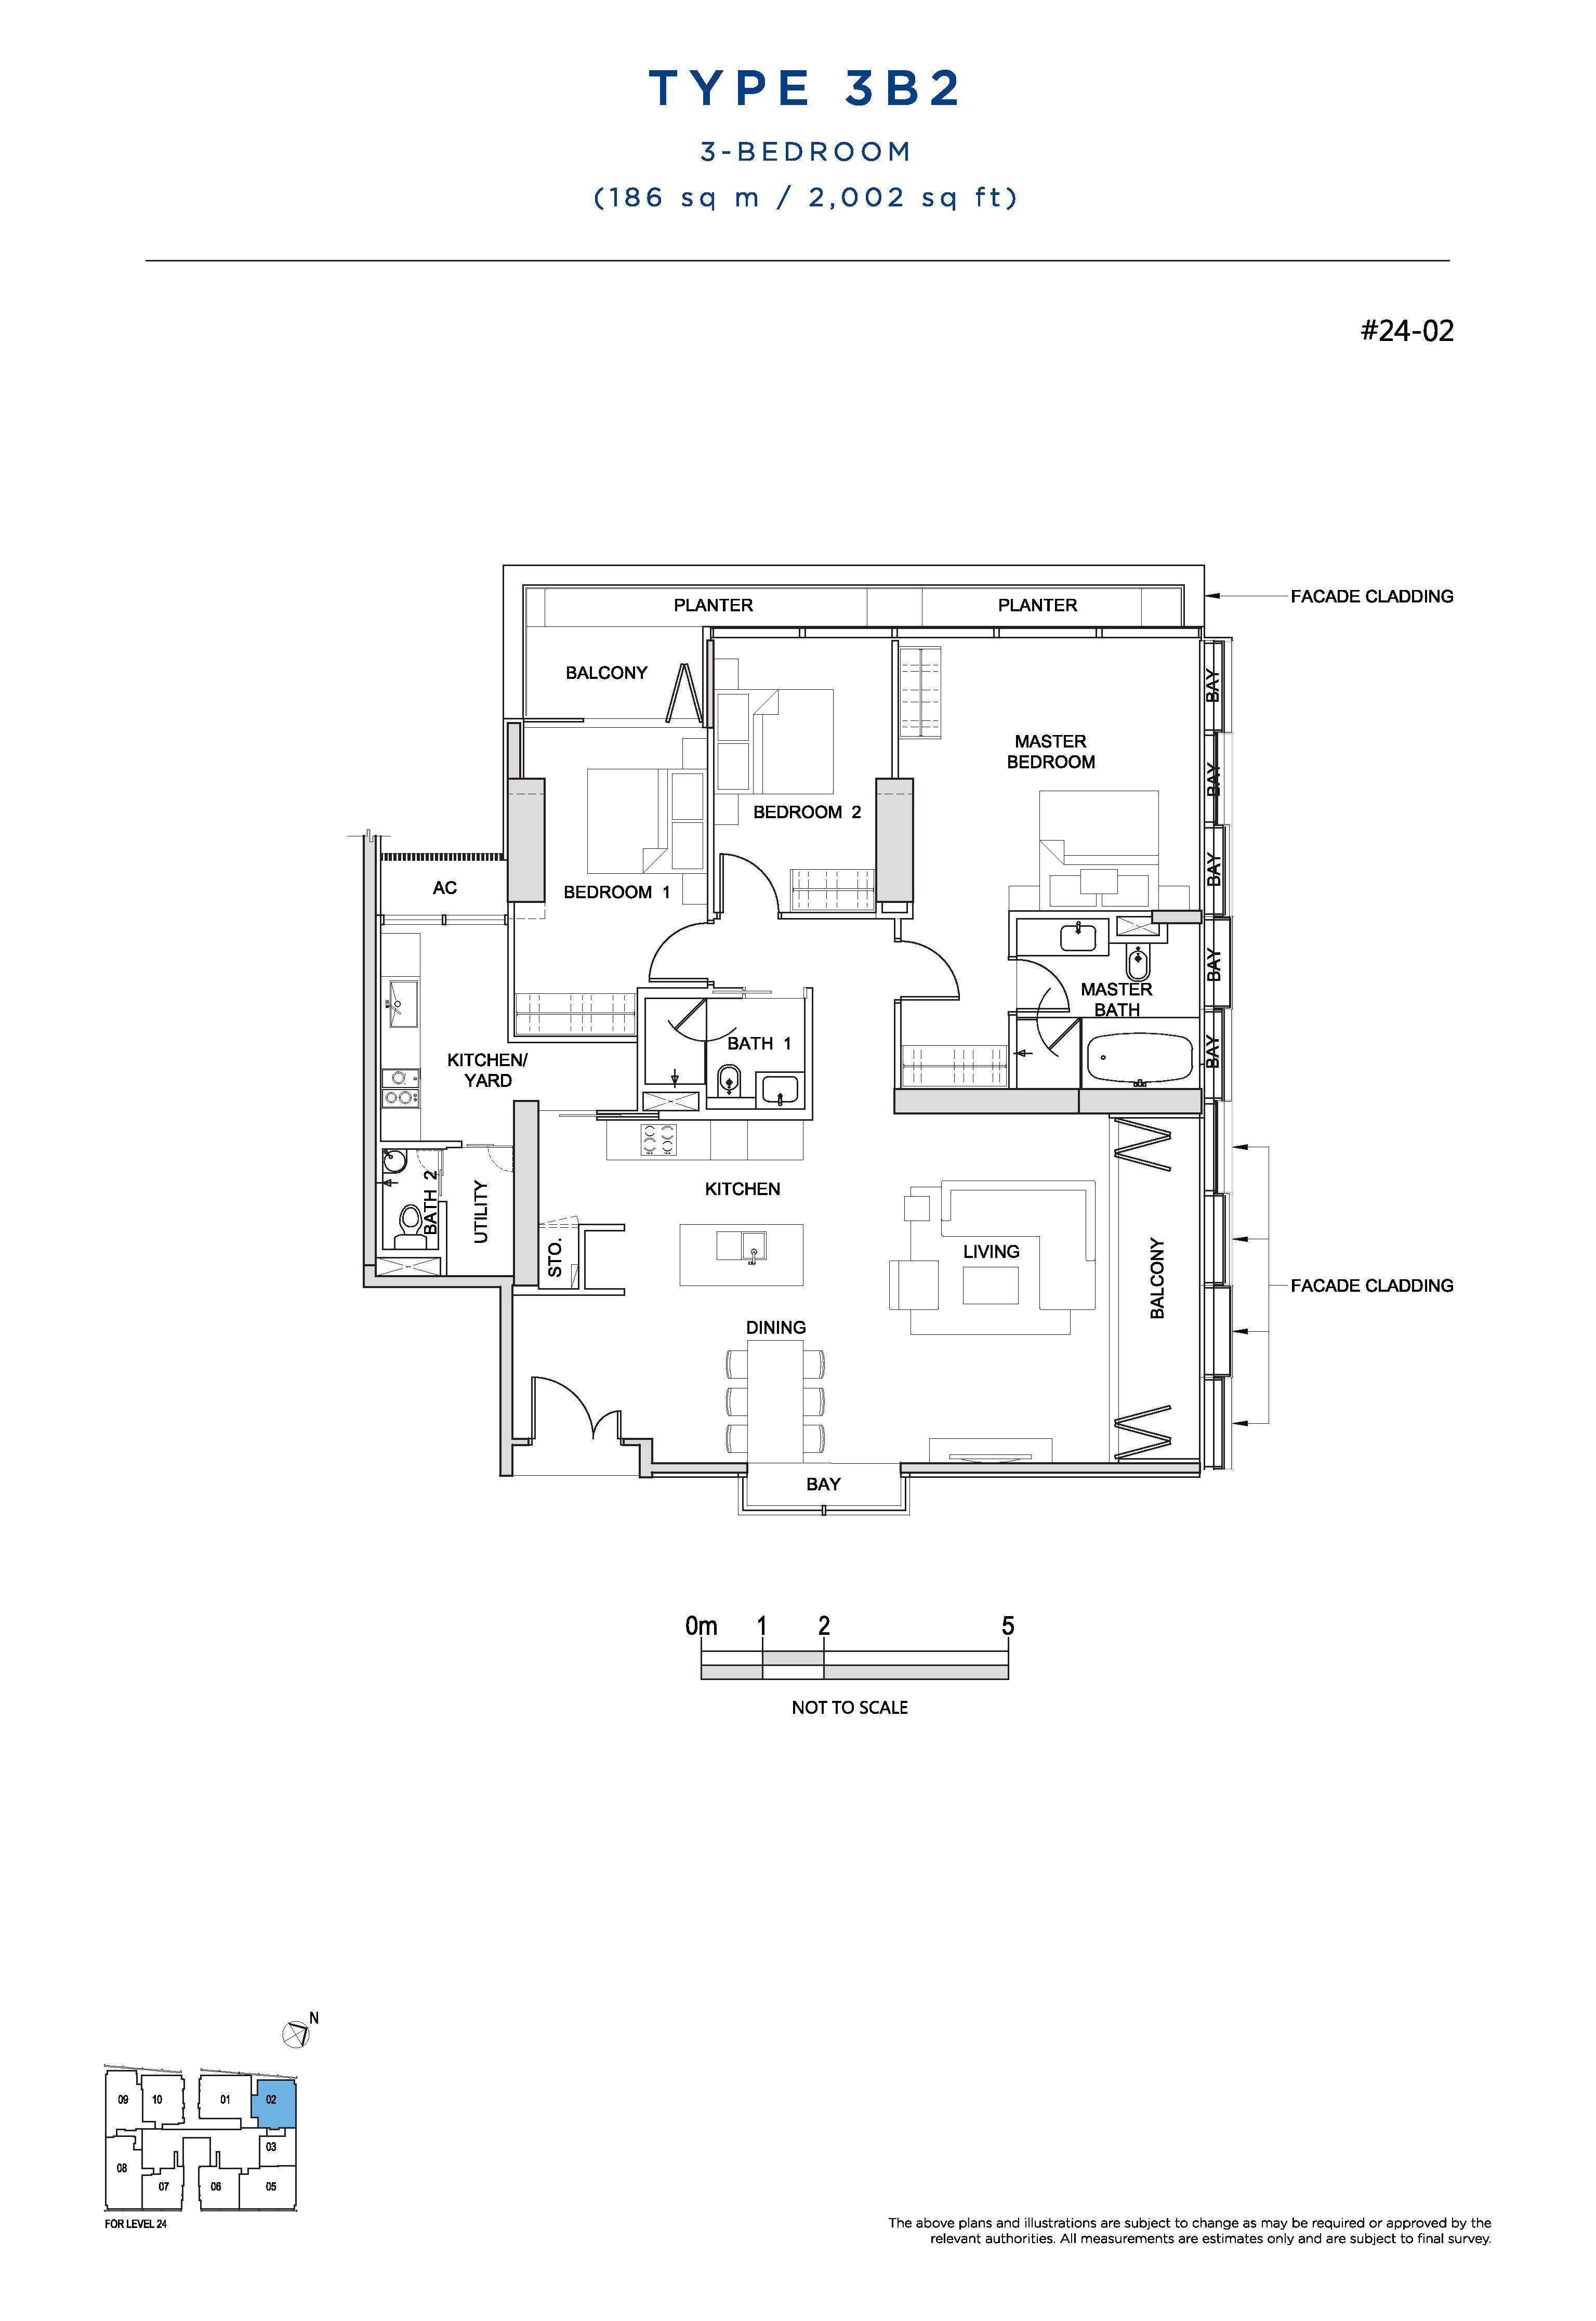 South Beach Residences 3 Bedroom Floor Plans Type 3B2